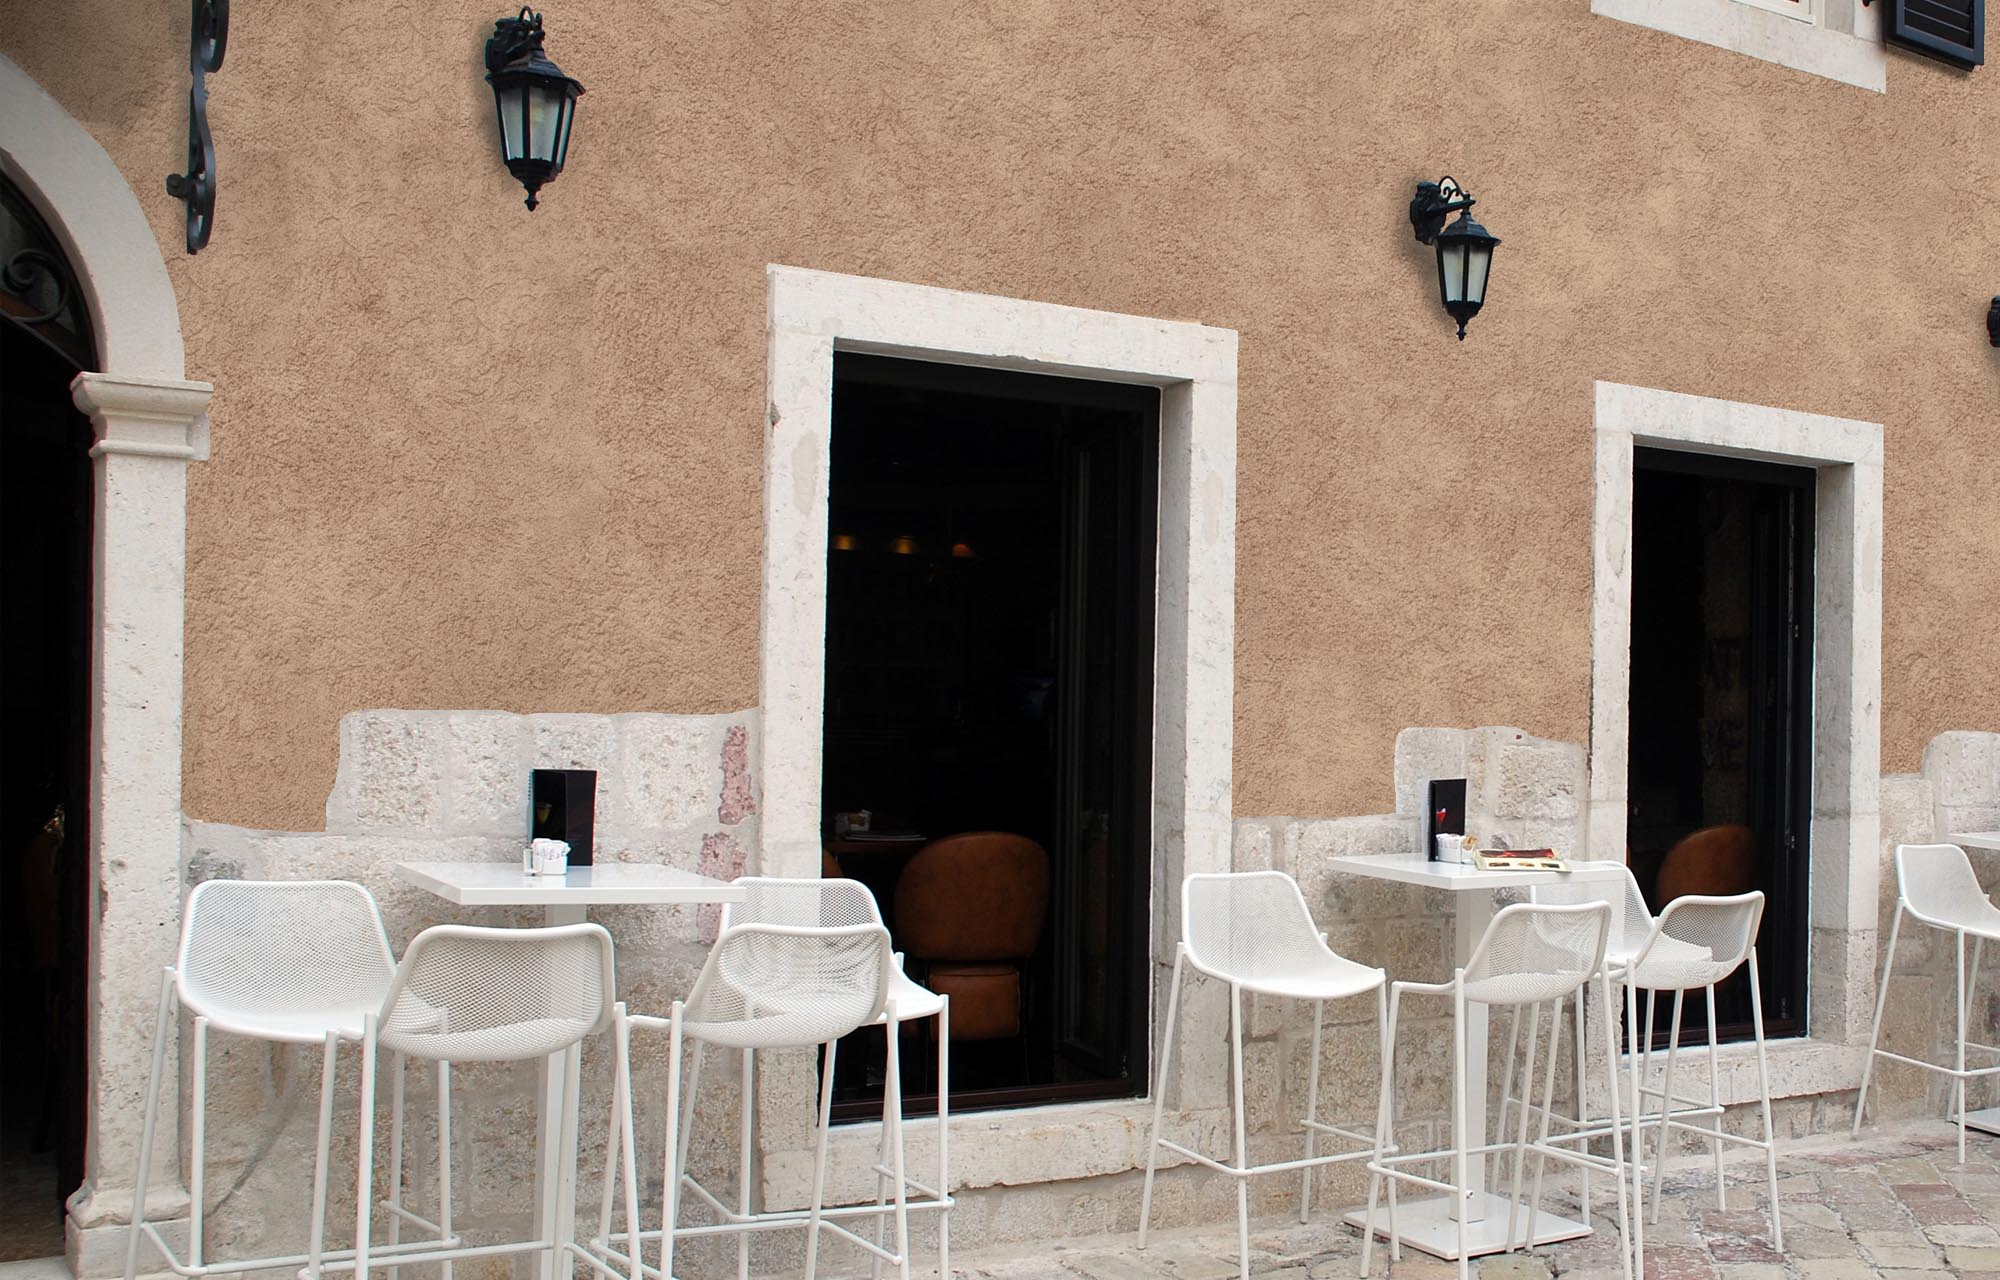 Cucina rustica cucina in stile in stile rustico di salm caminetti come ottenere un muro interno - Pitture per cucine rustiche ...